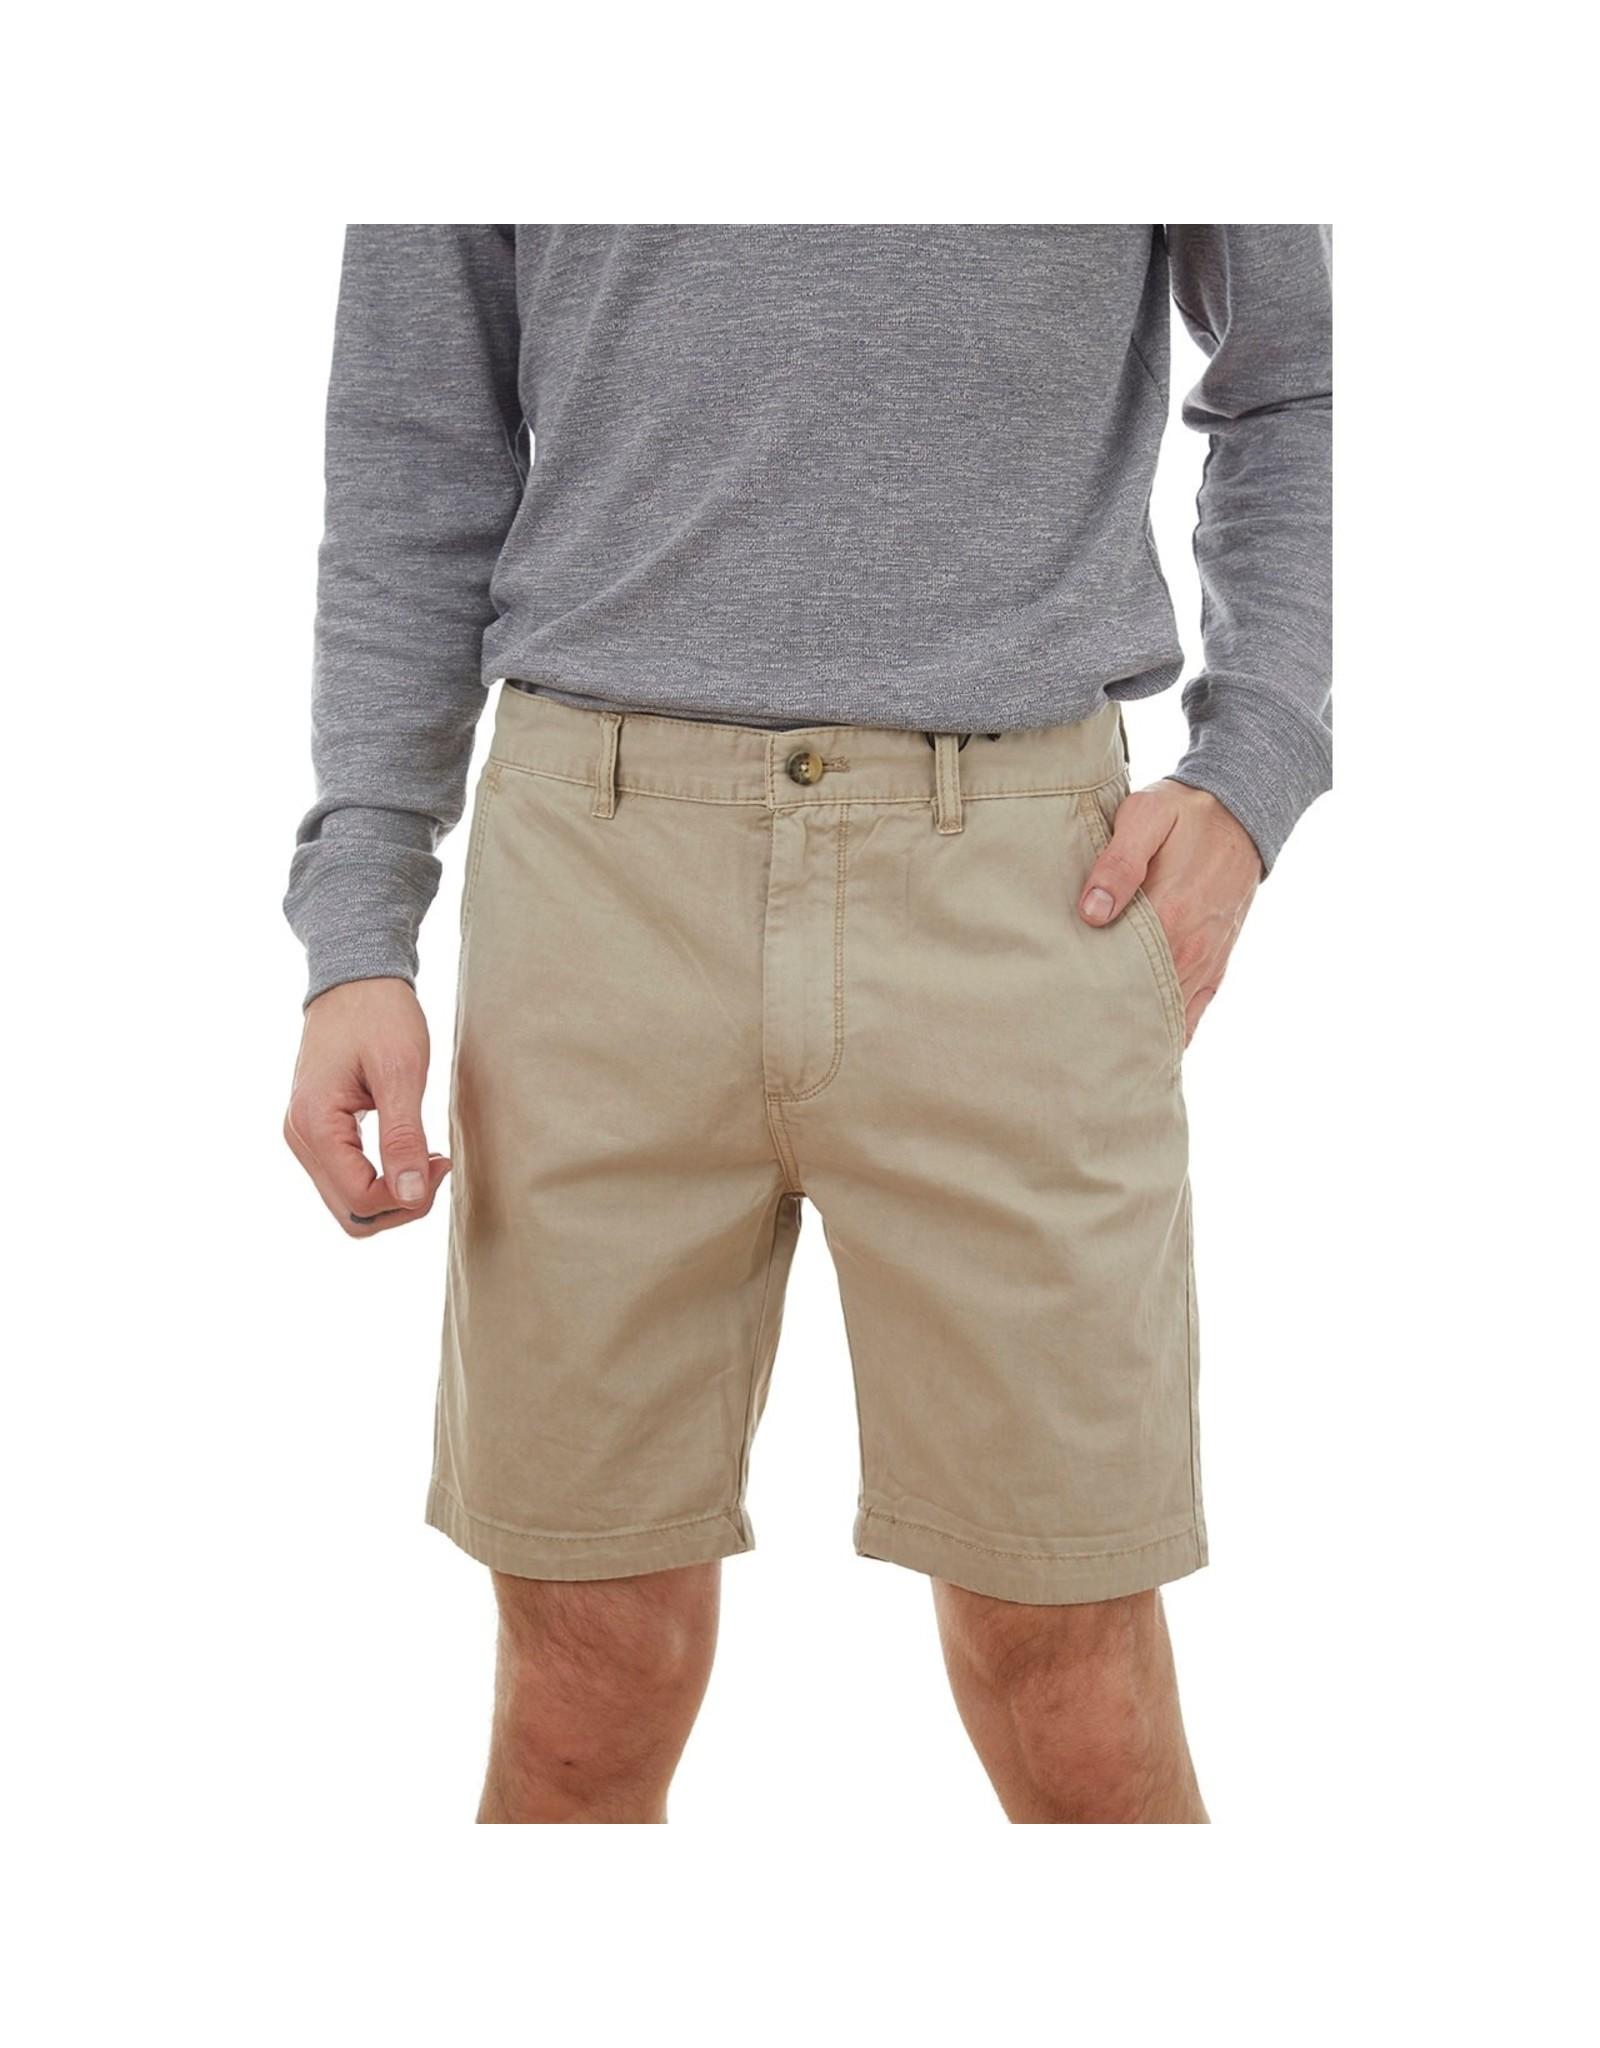 PX Twill Shorts